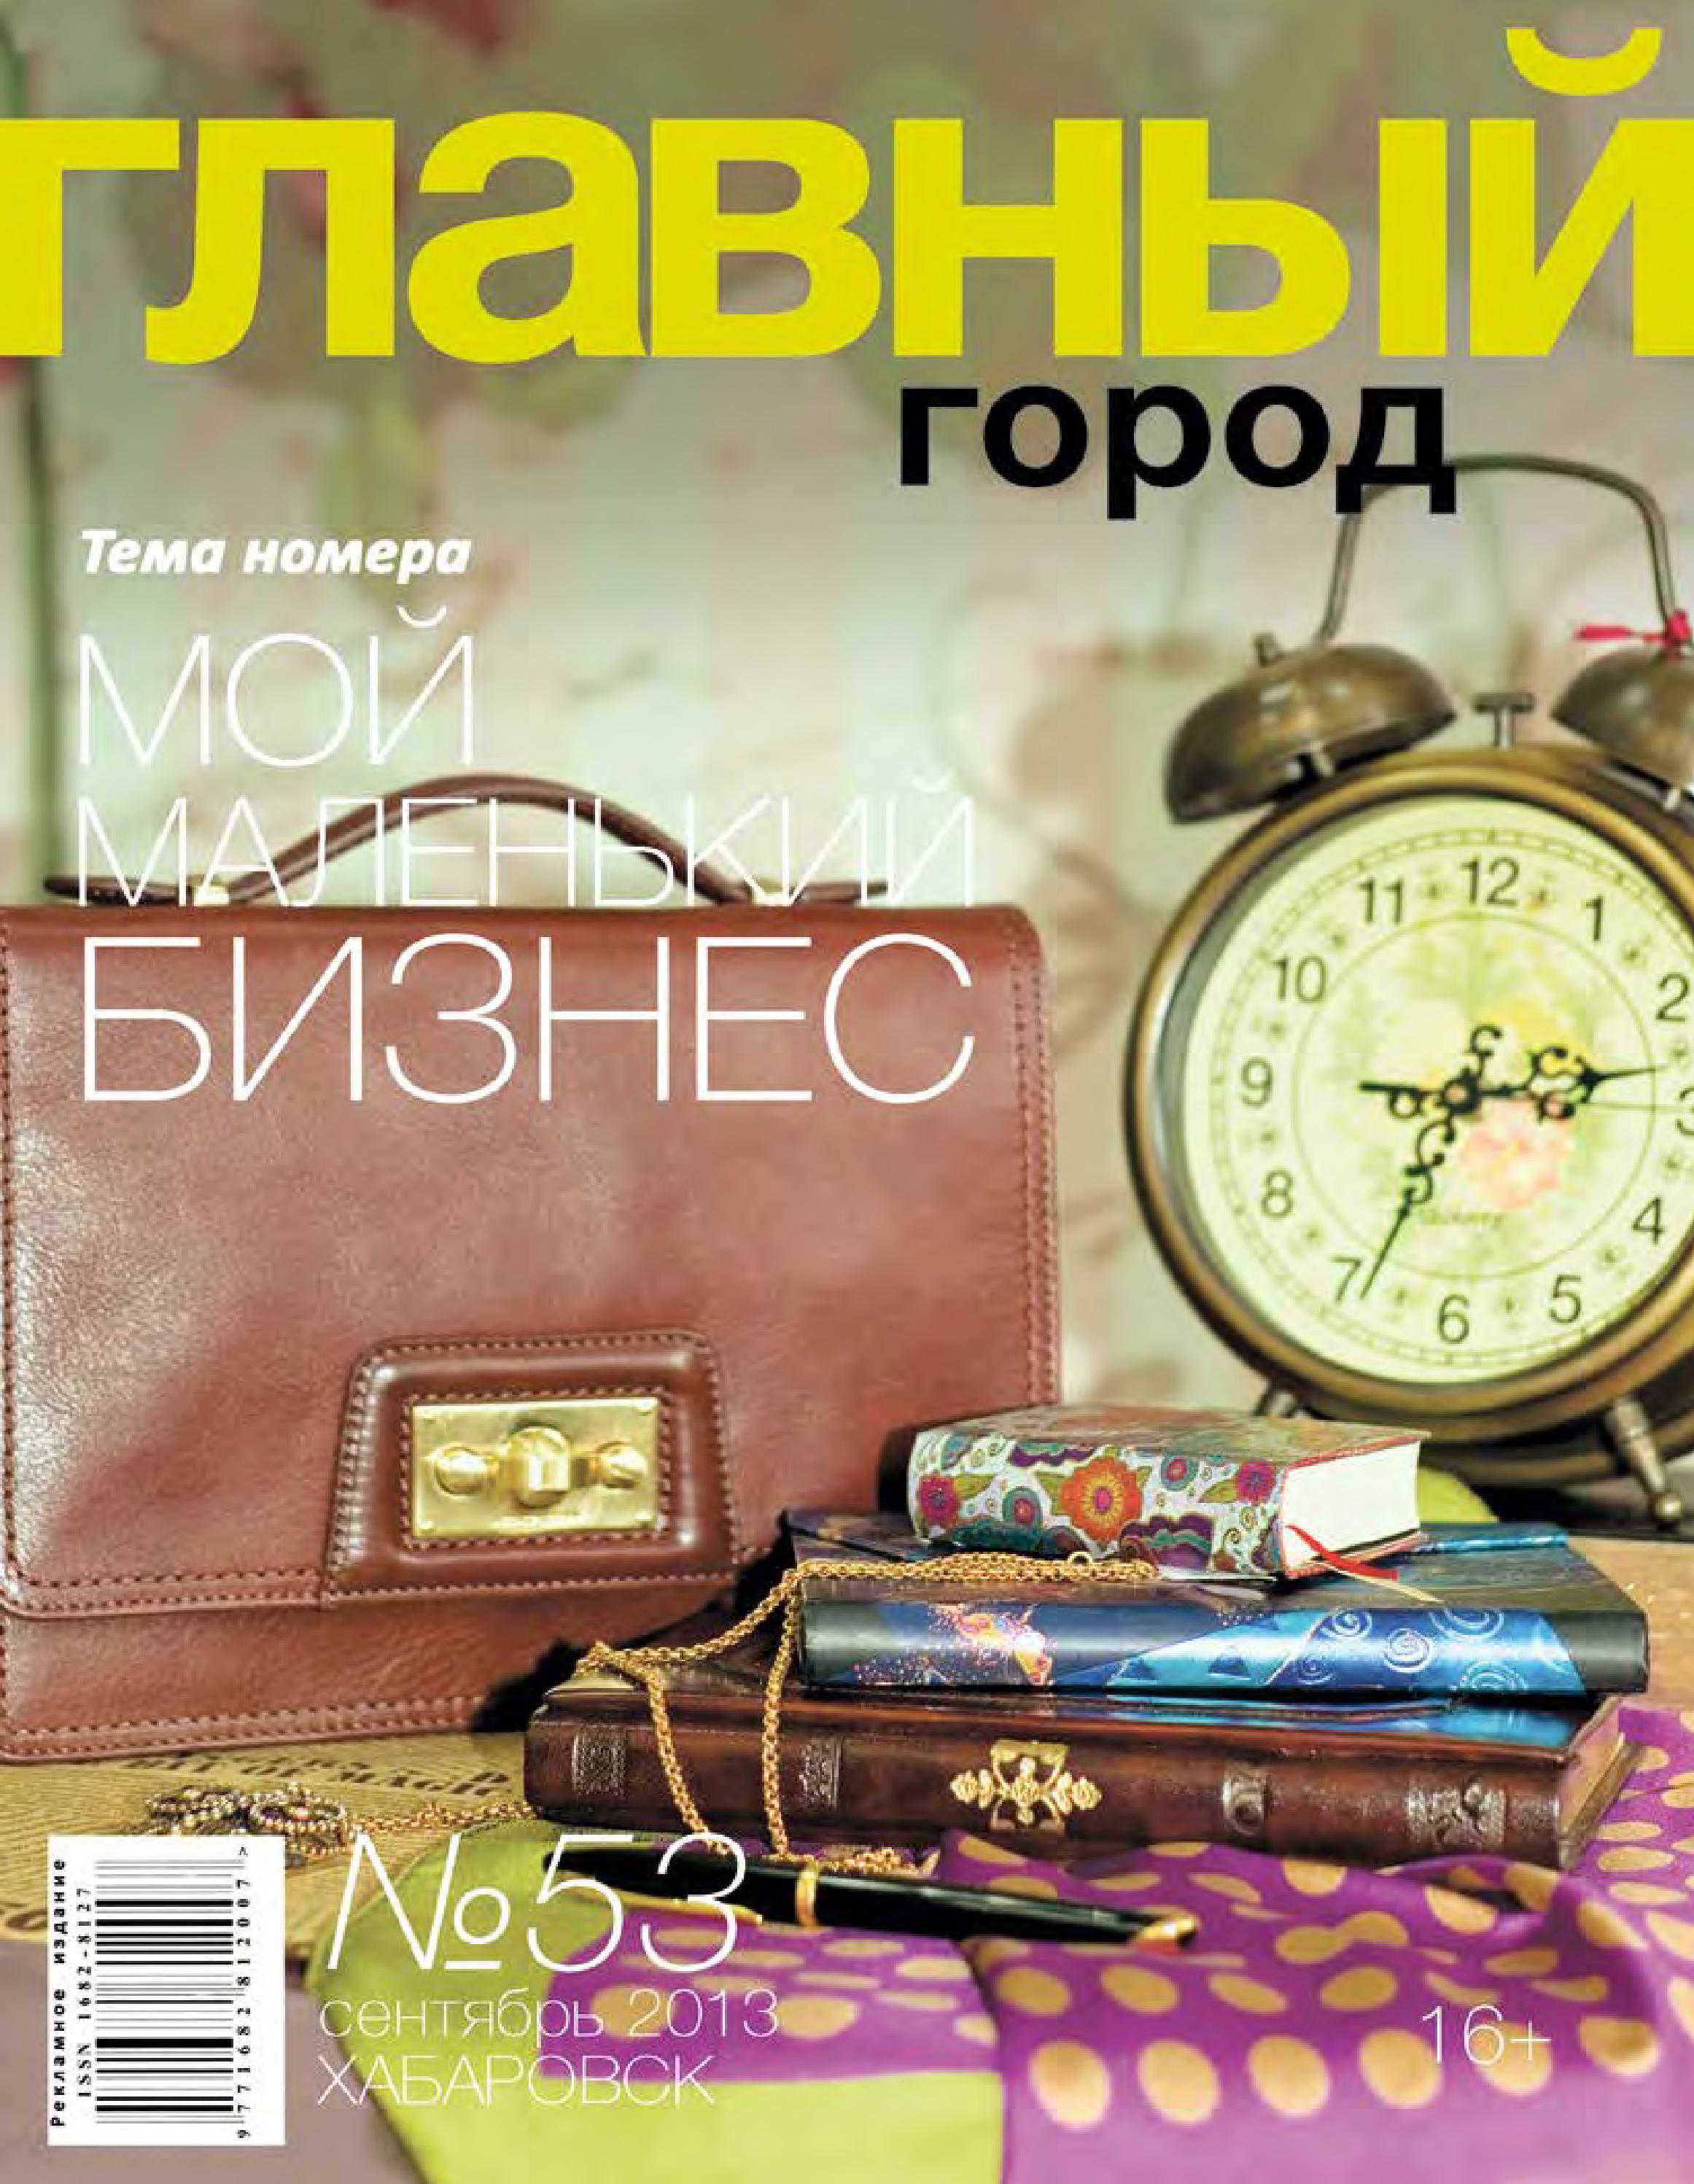 d297a8956d02 ГЛАВНЫЙ ГОРОД by Главный Город - issuu